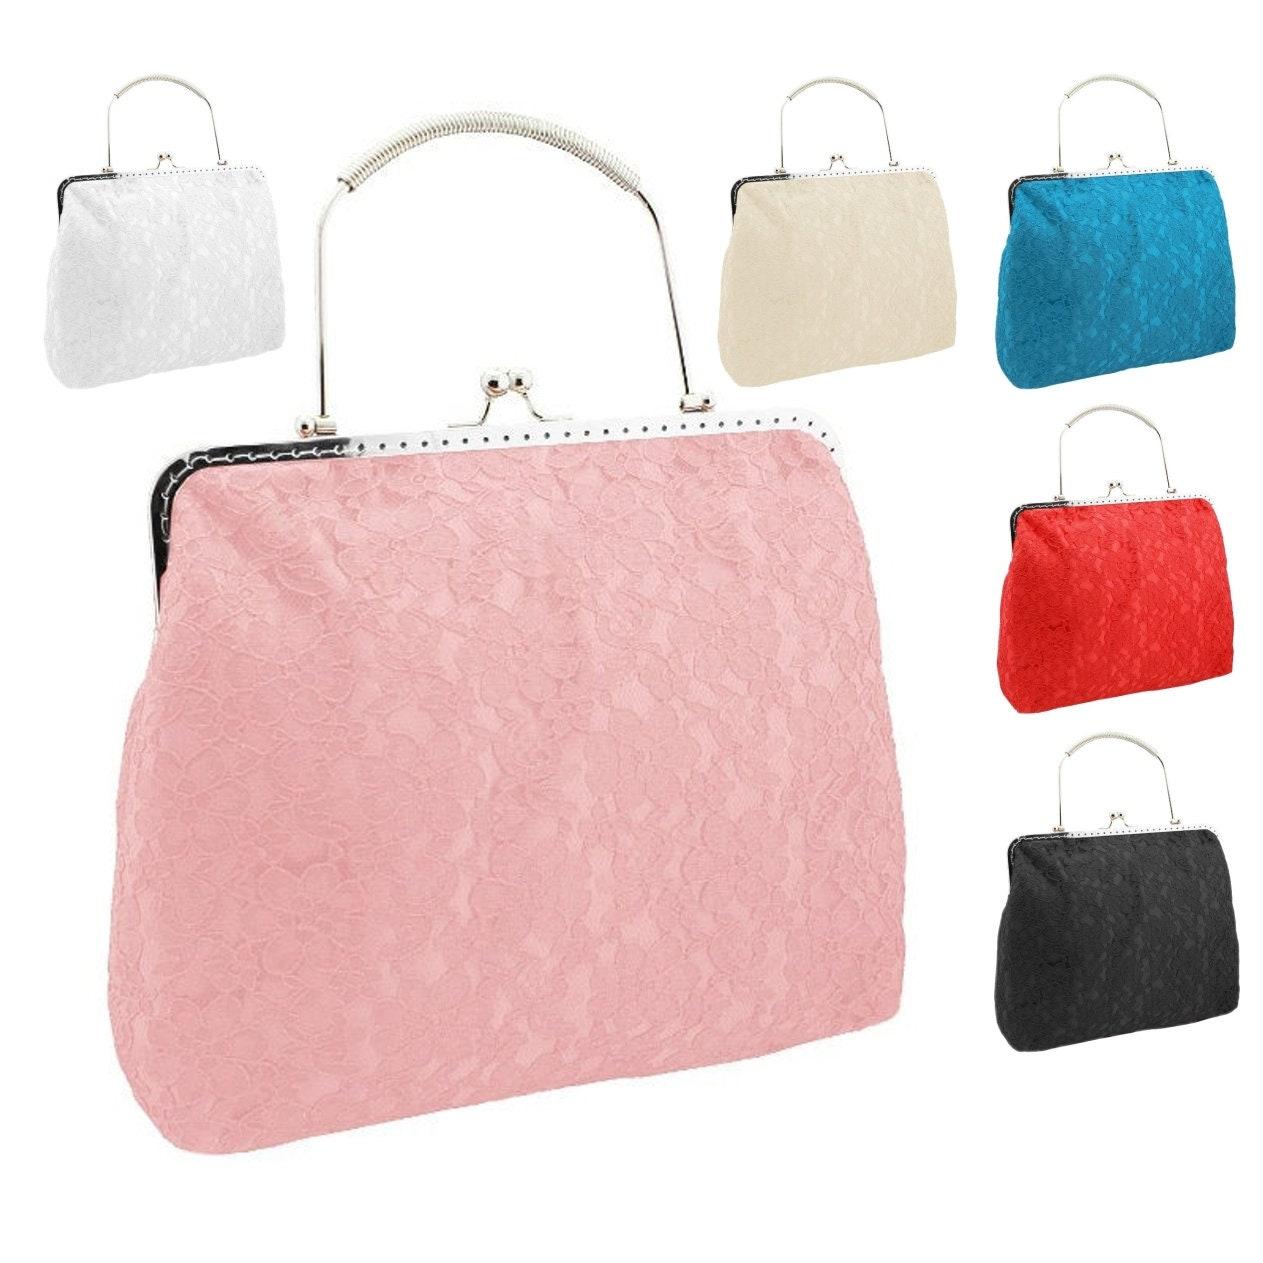 cfcc034f86cb Women handbag pink purse pink clutch bridal clutch bridal bag   Etsy